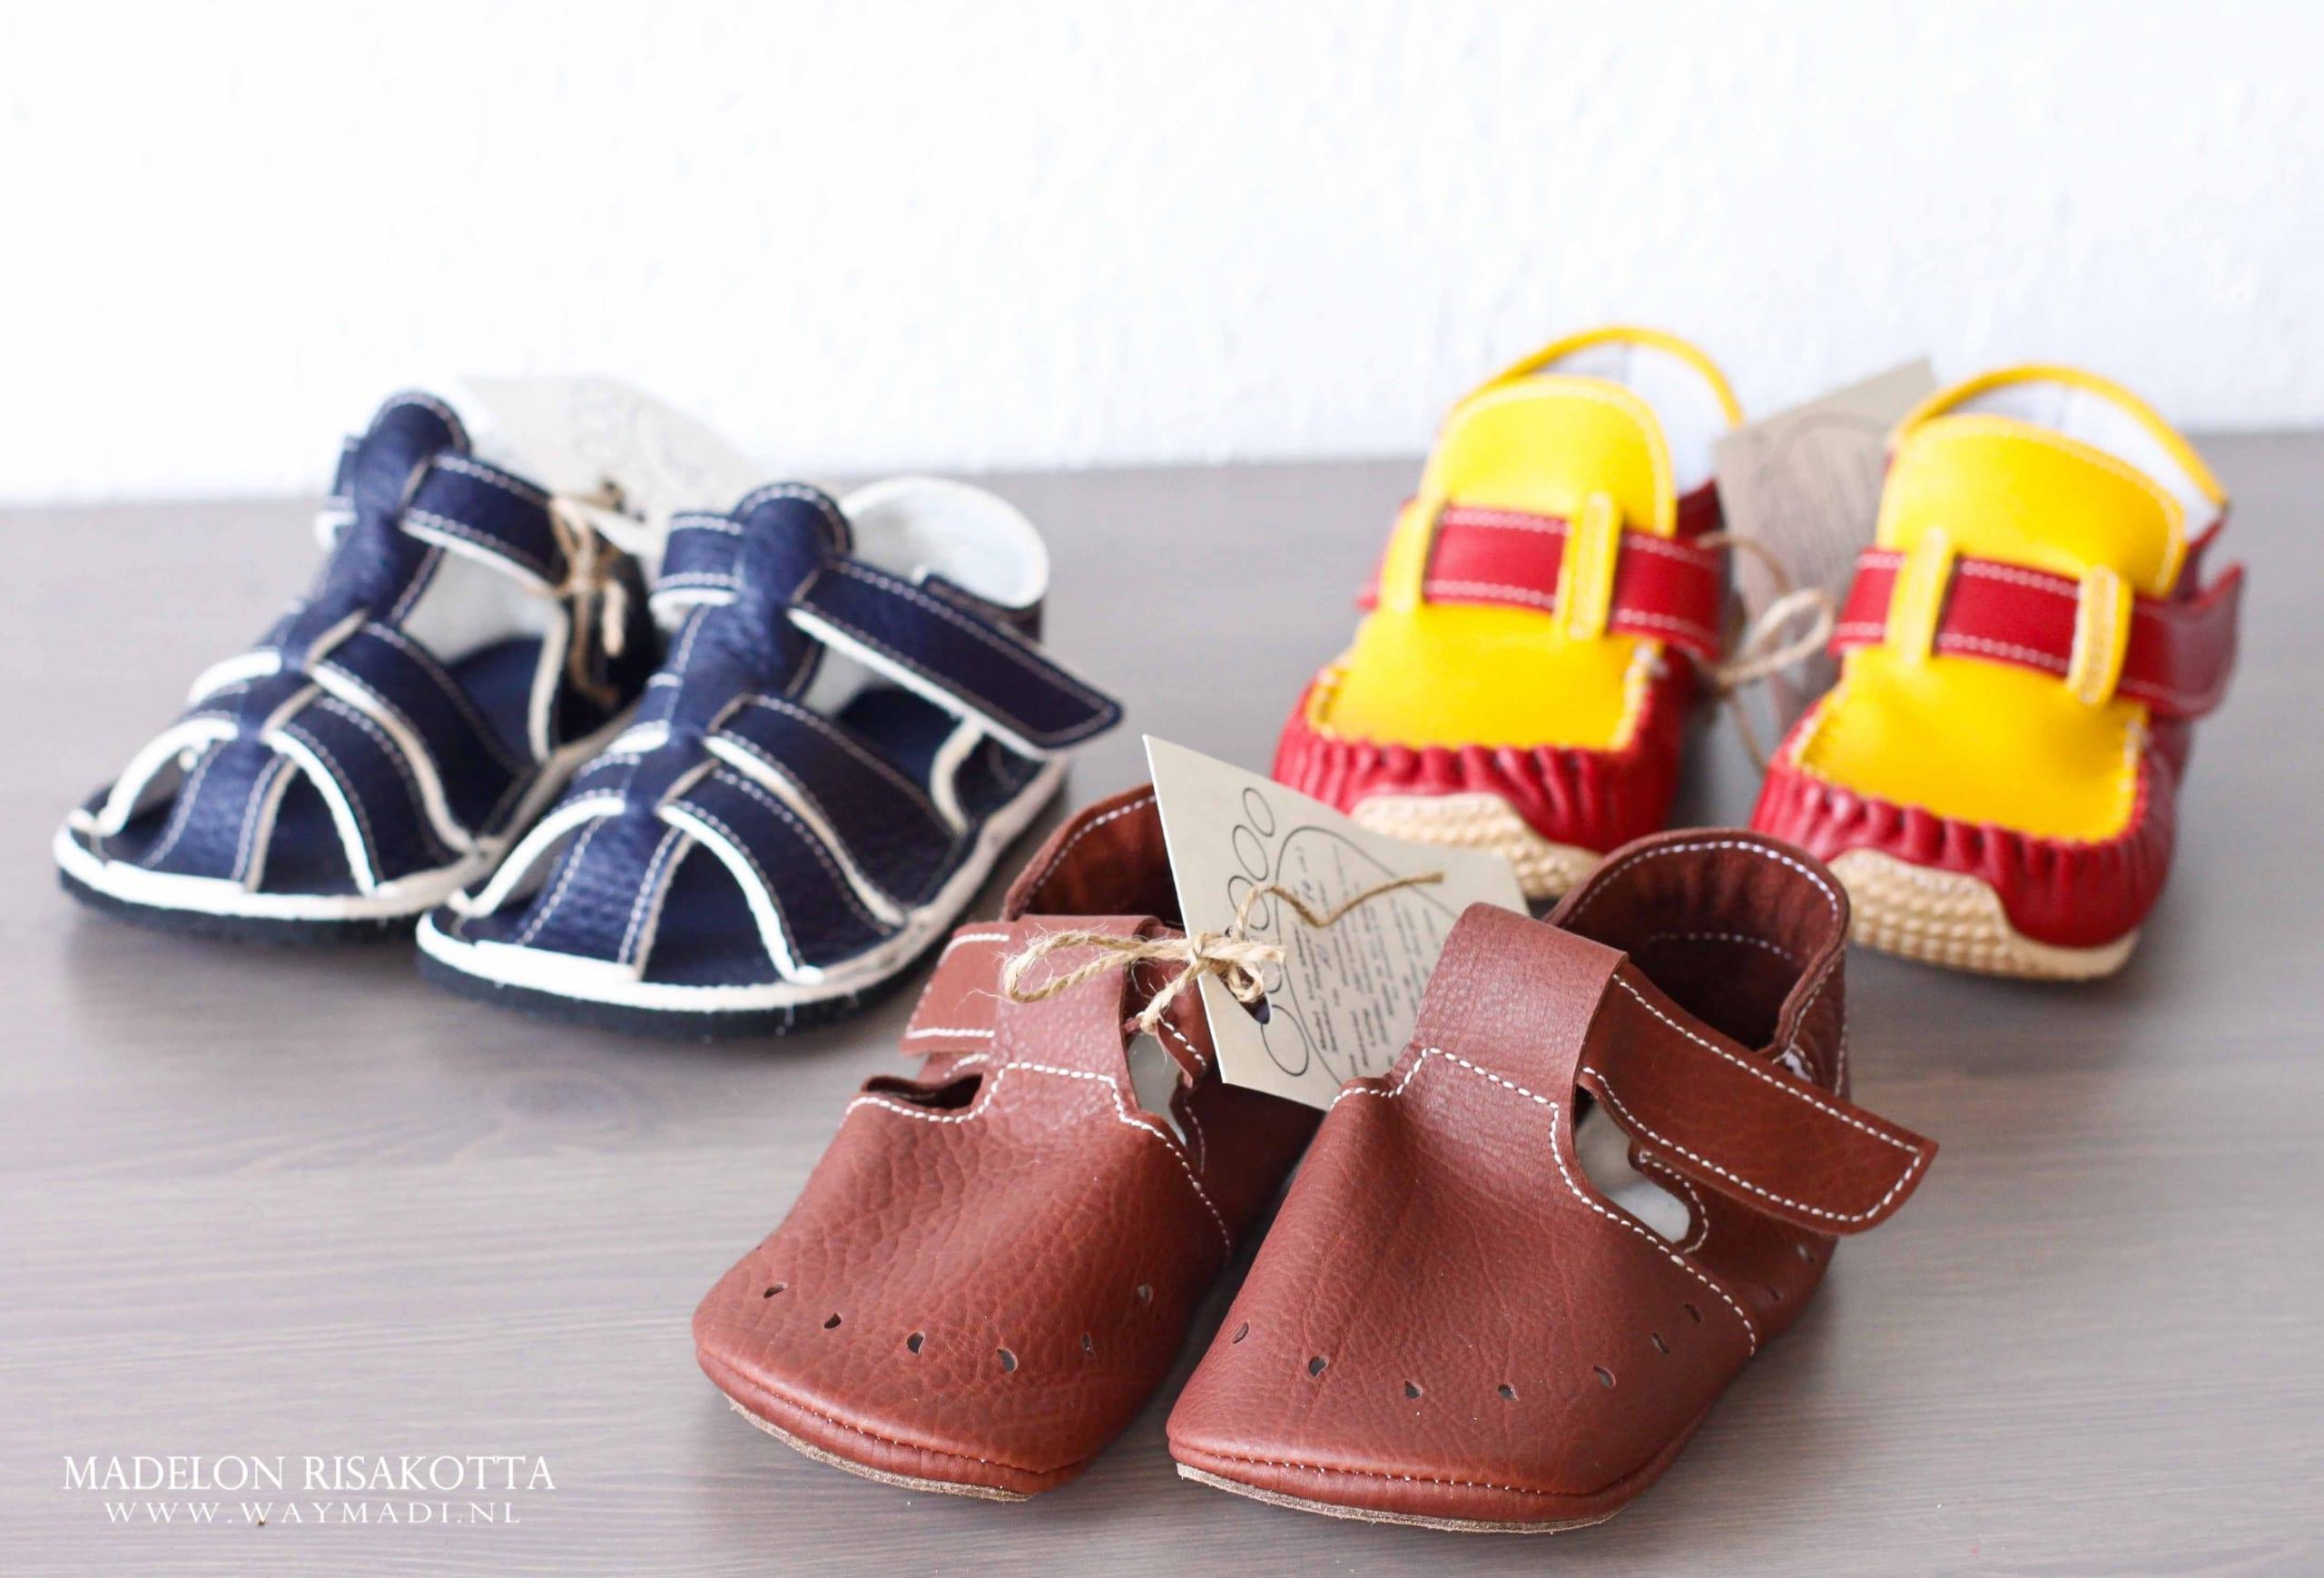 ZEAZOOkids Must Have 'Close to Barefoot' Schoentjes!